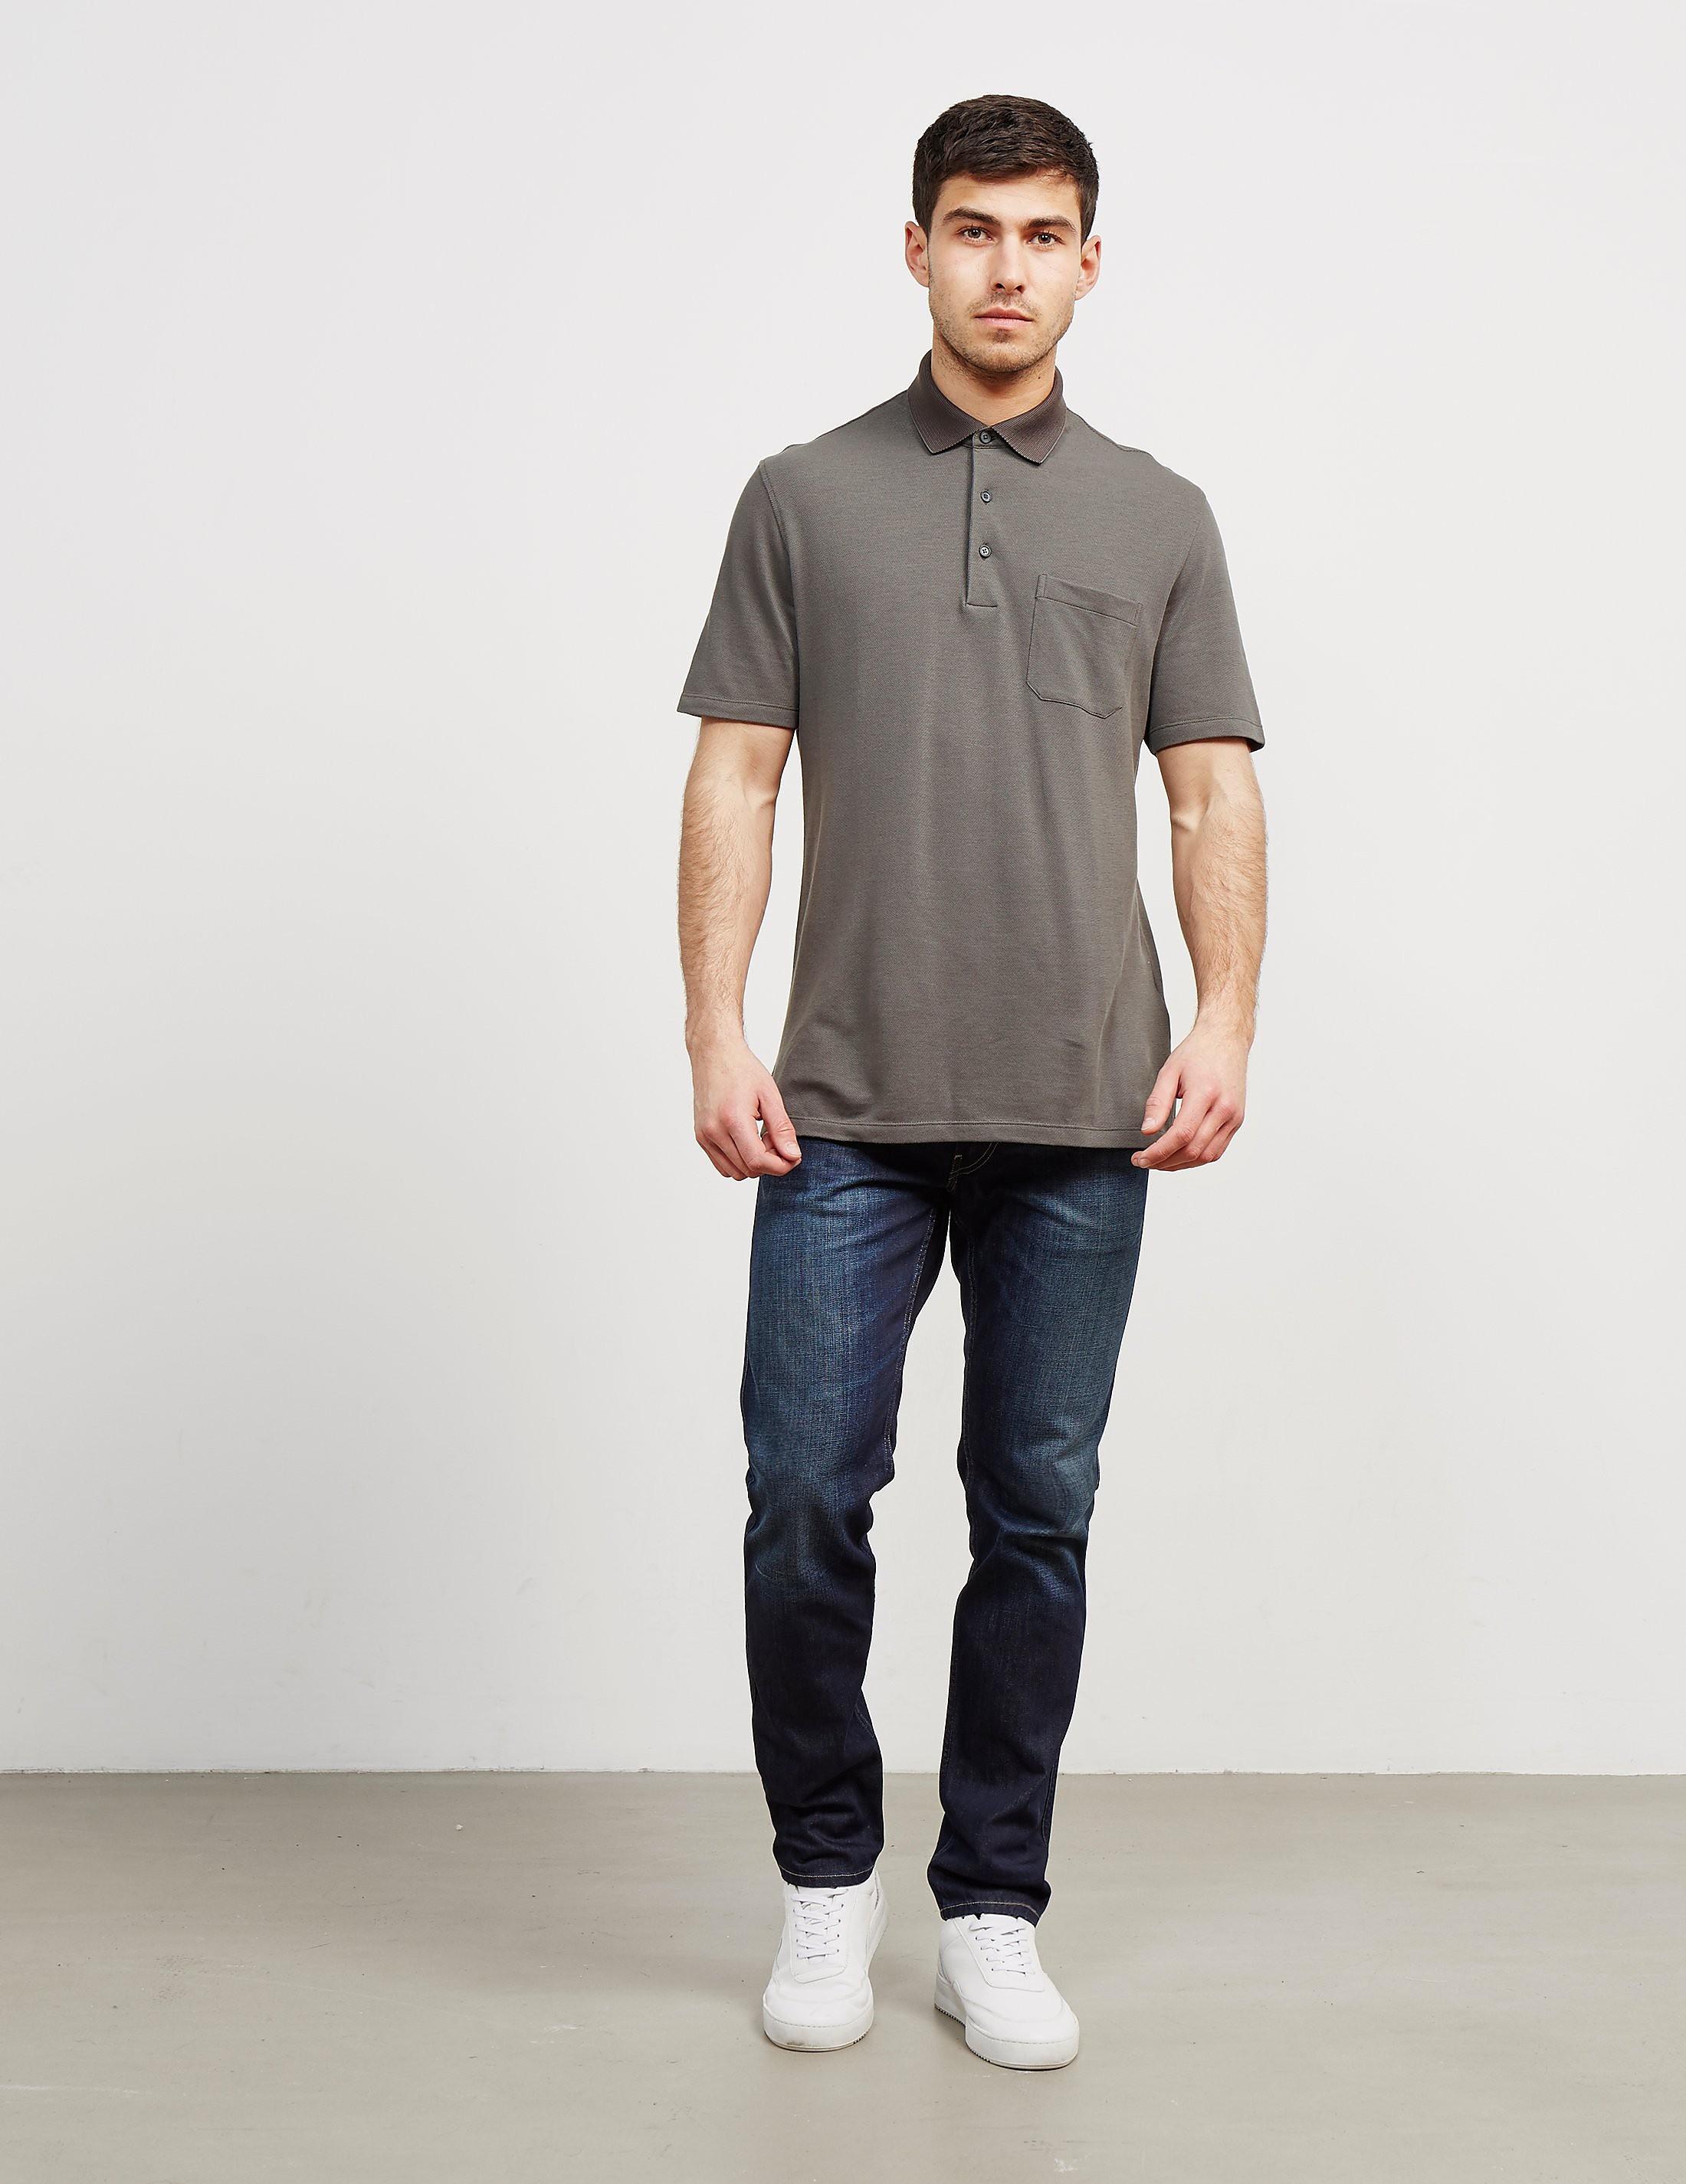 Z Zegna Pocket Short Sleeve Polo Shirt